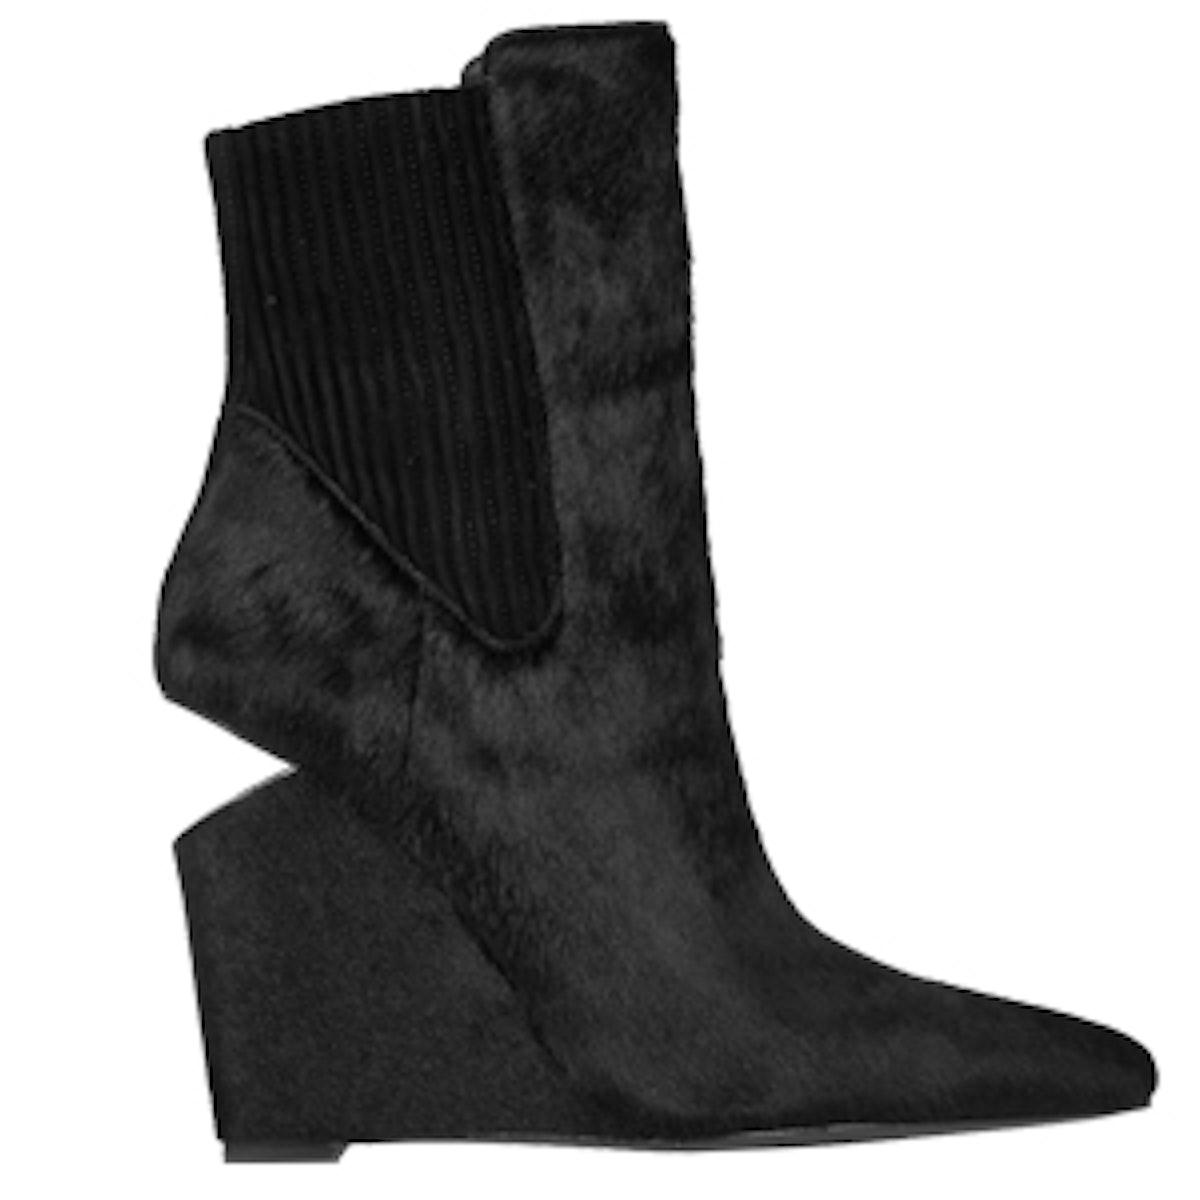 Andie Calf Hair Wedge Boots